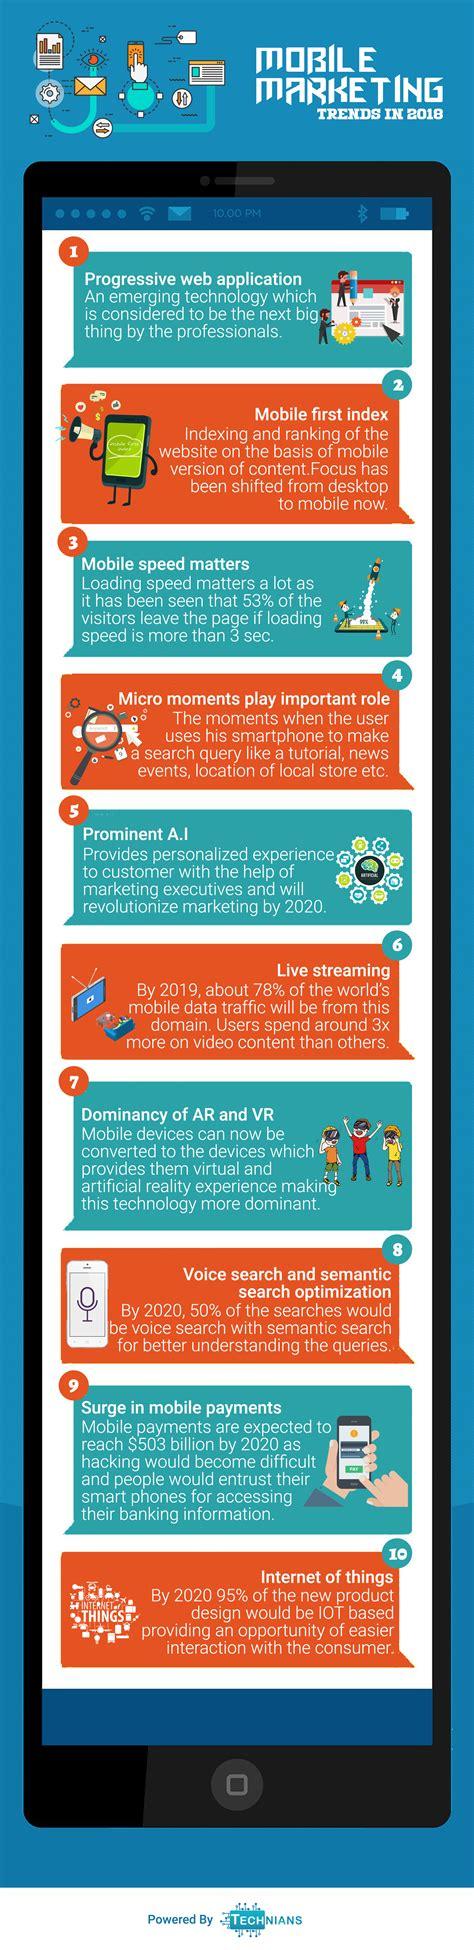 mobile marketing trends mobile marketing trends in 2018